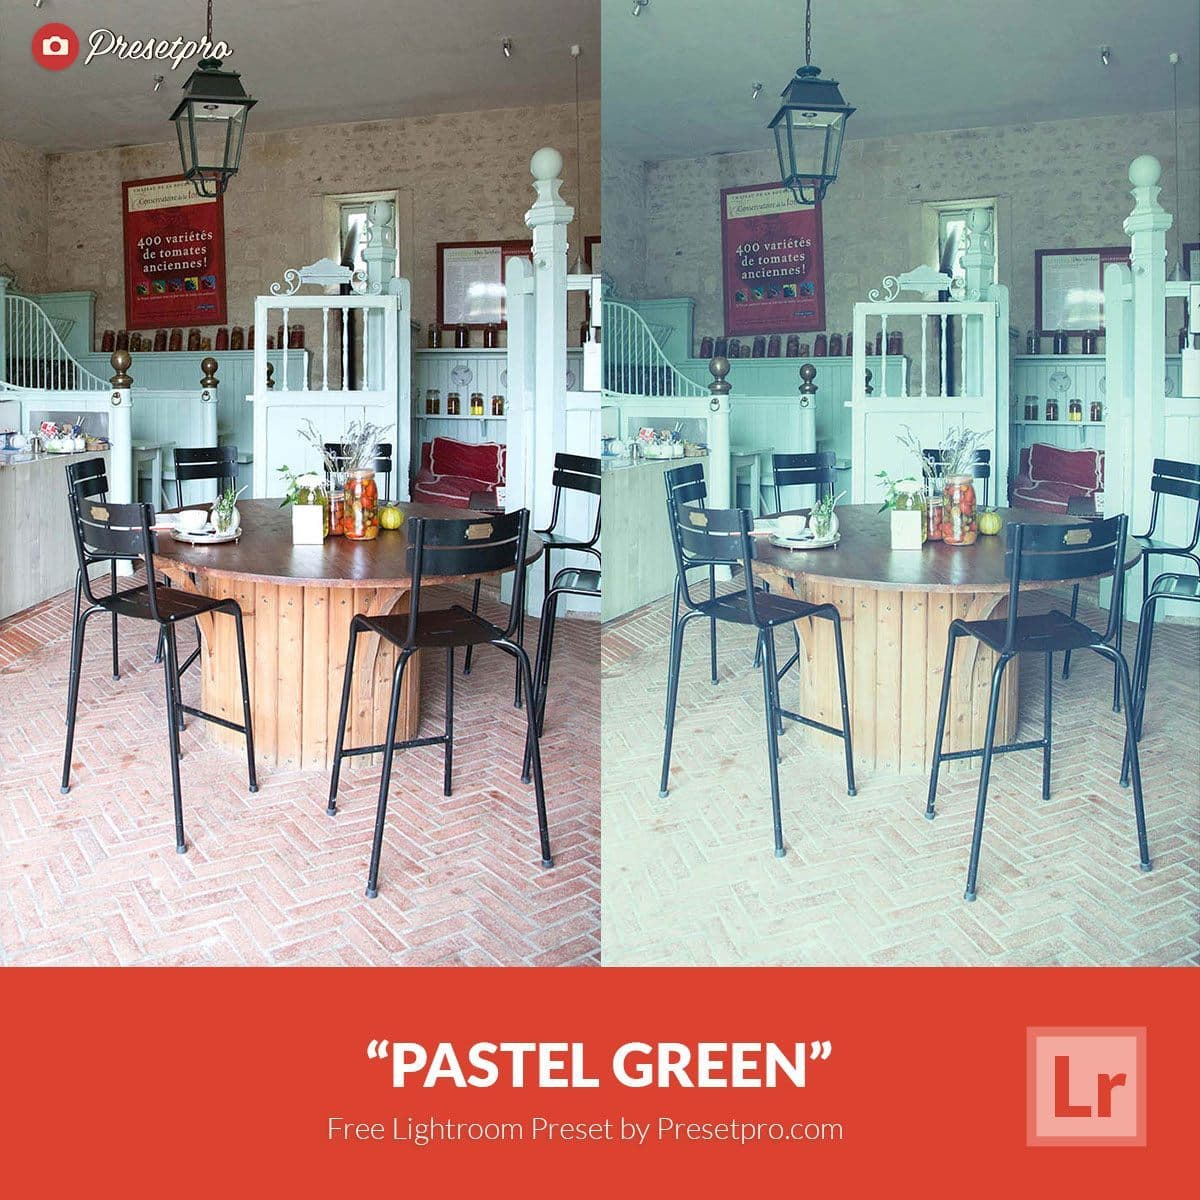 Free-Lightroom-Preset-Pastel-Green-Presetpro.com